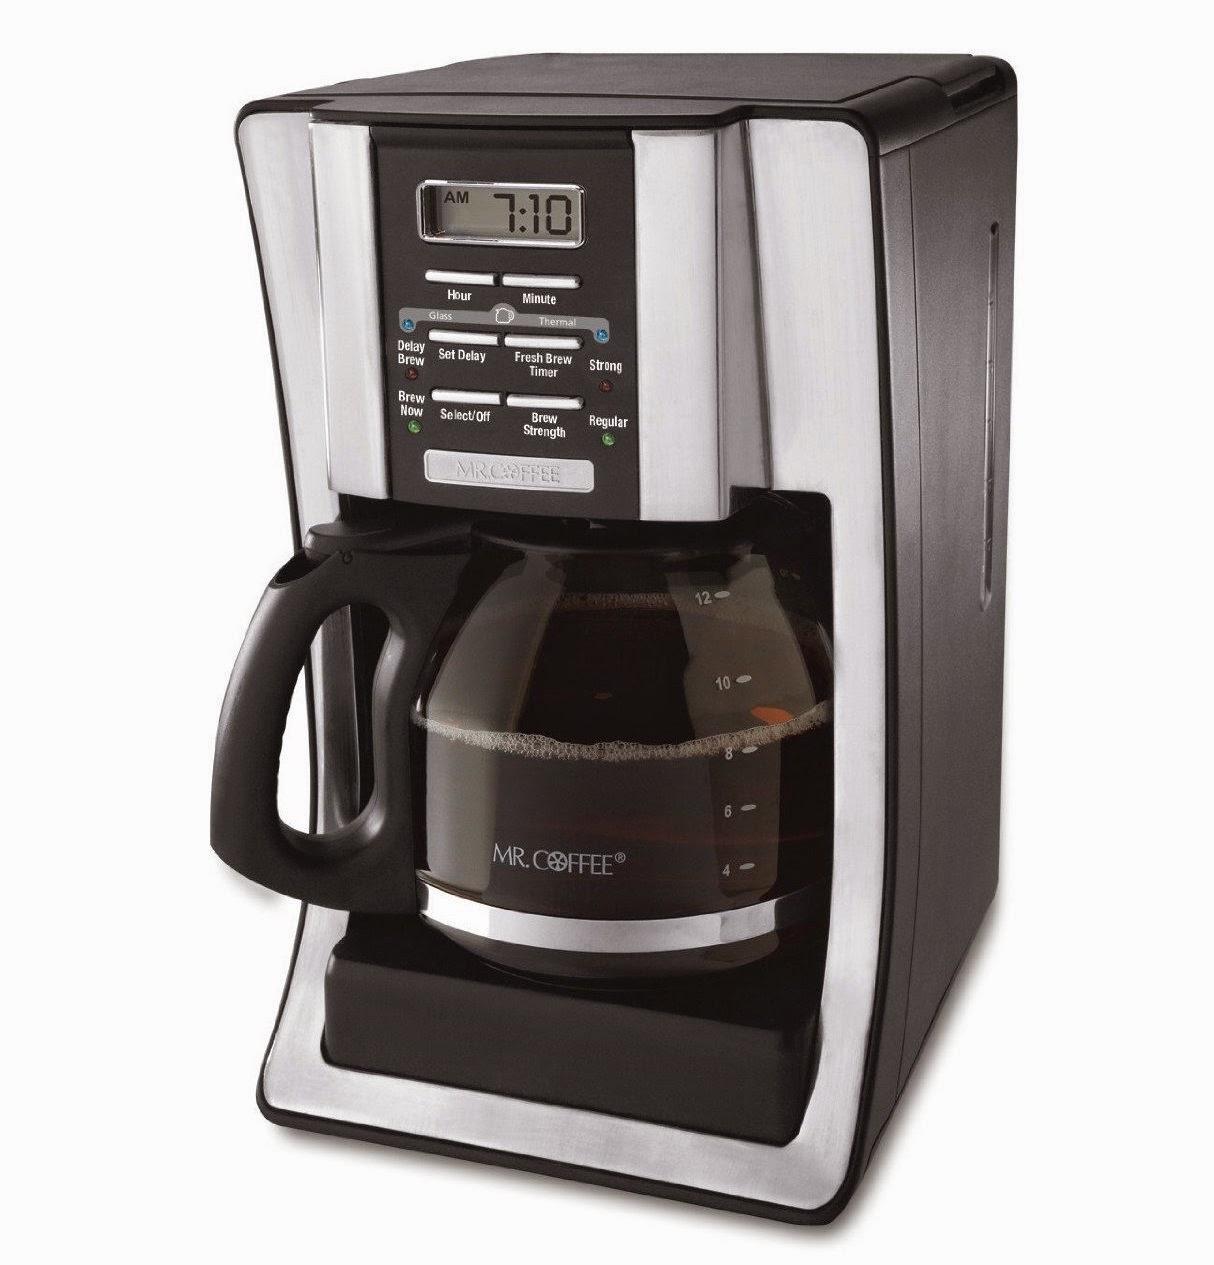 Mr. Coffee BVMC-SJX33GT